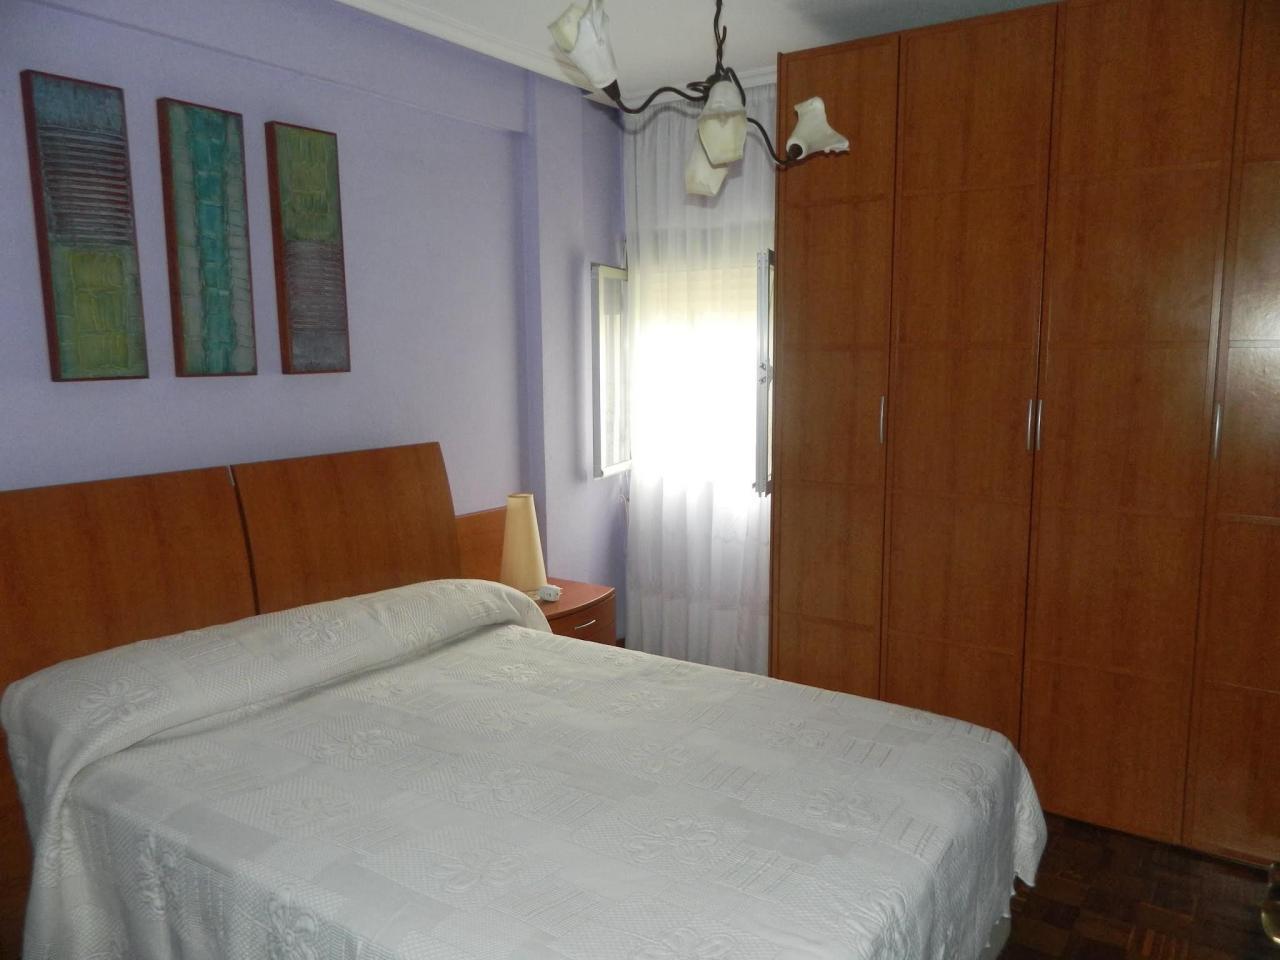 Habitaciones en alquiler Zarautz, Guipúzcoa